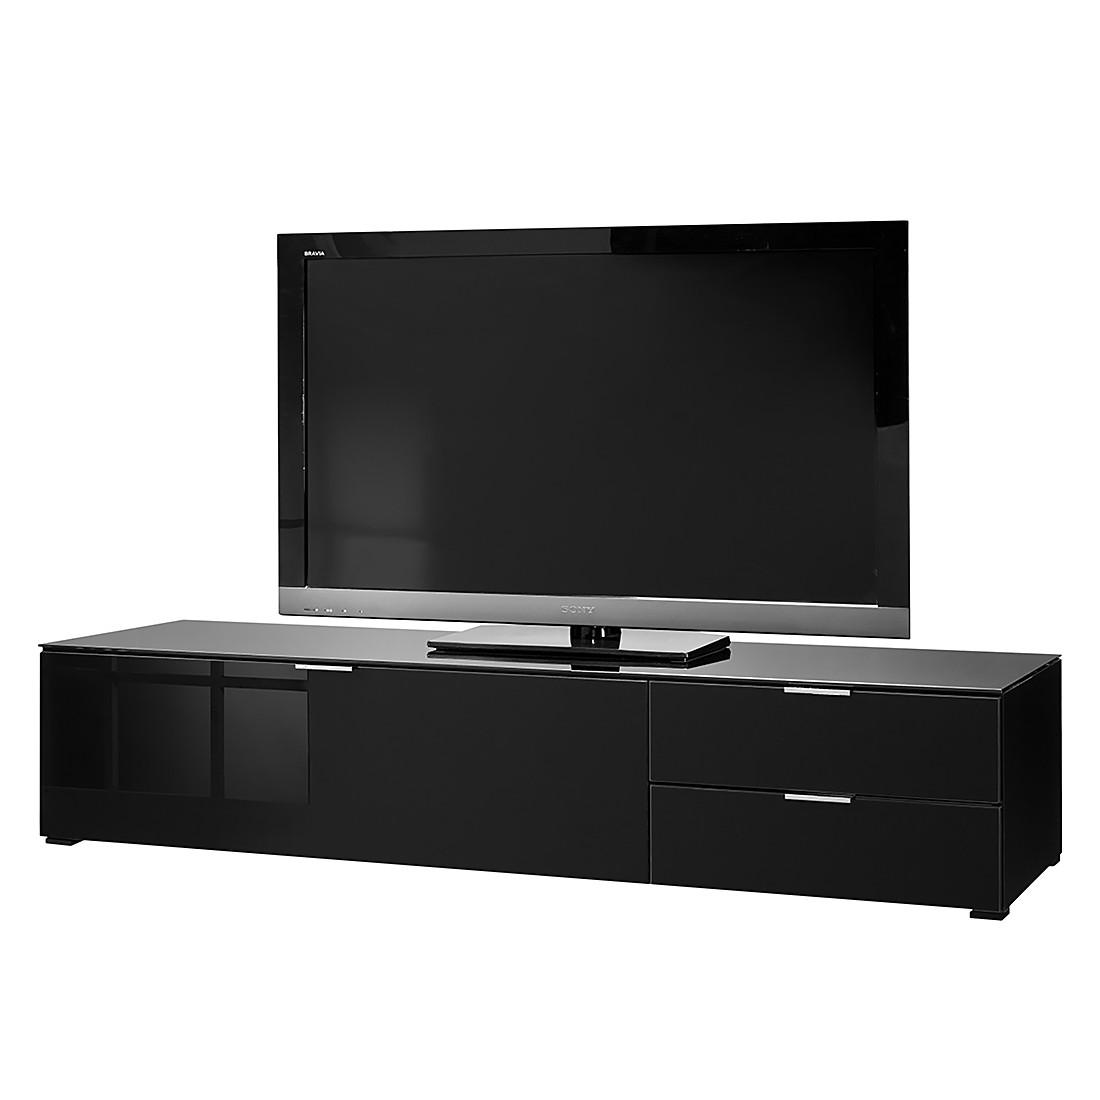 Meuble tv profondeur 50 cm noir profondeur 50 cm noir for Meuble tv 50